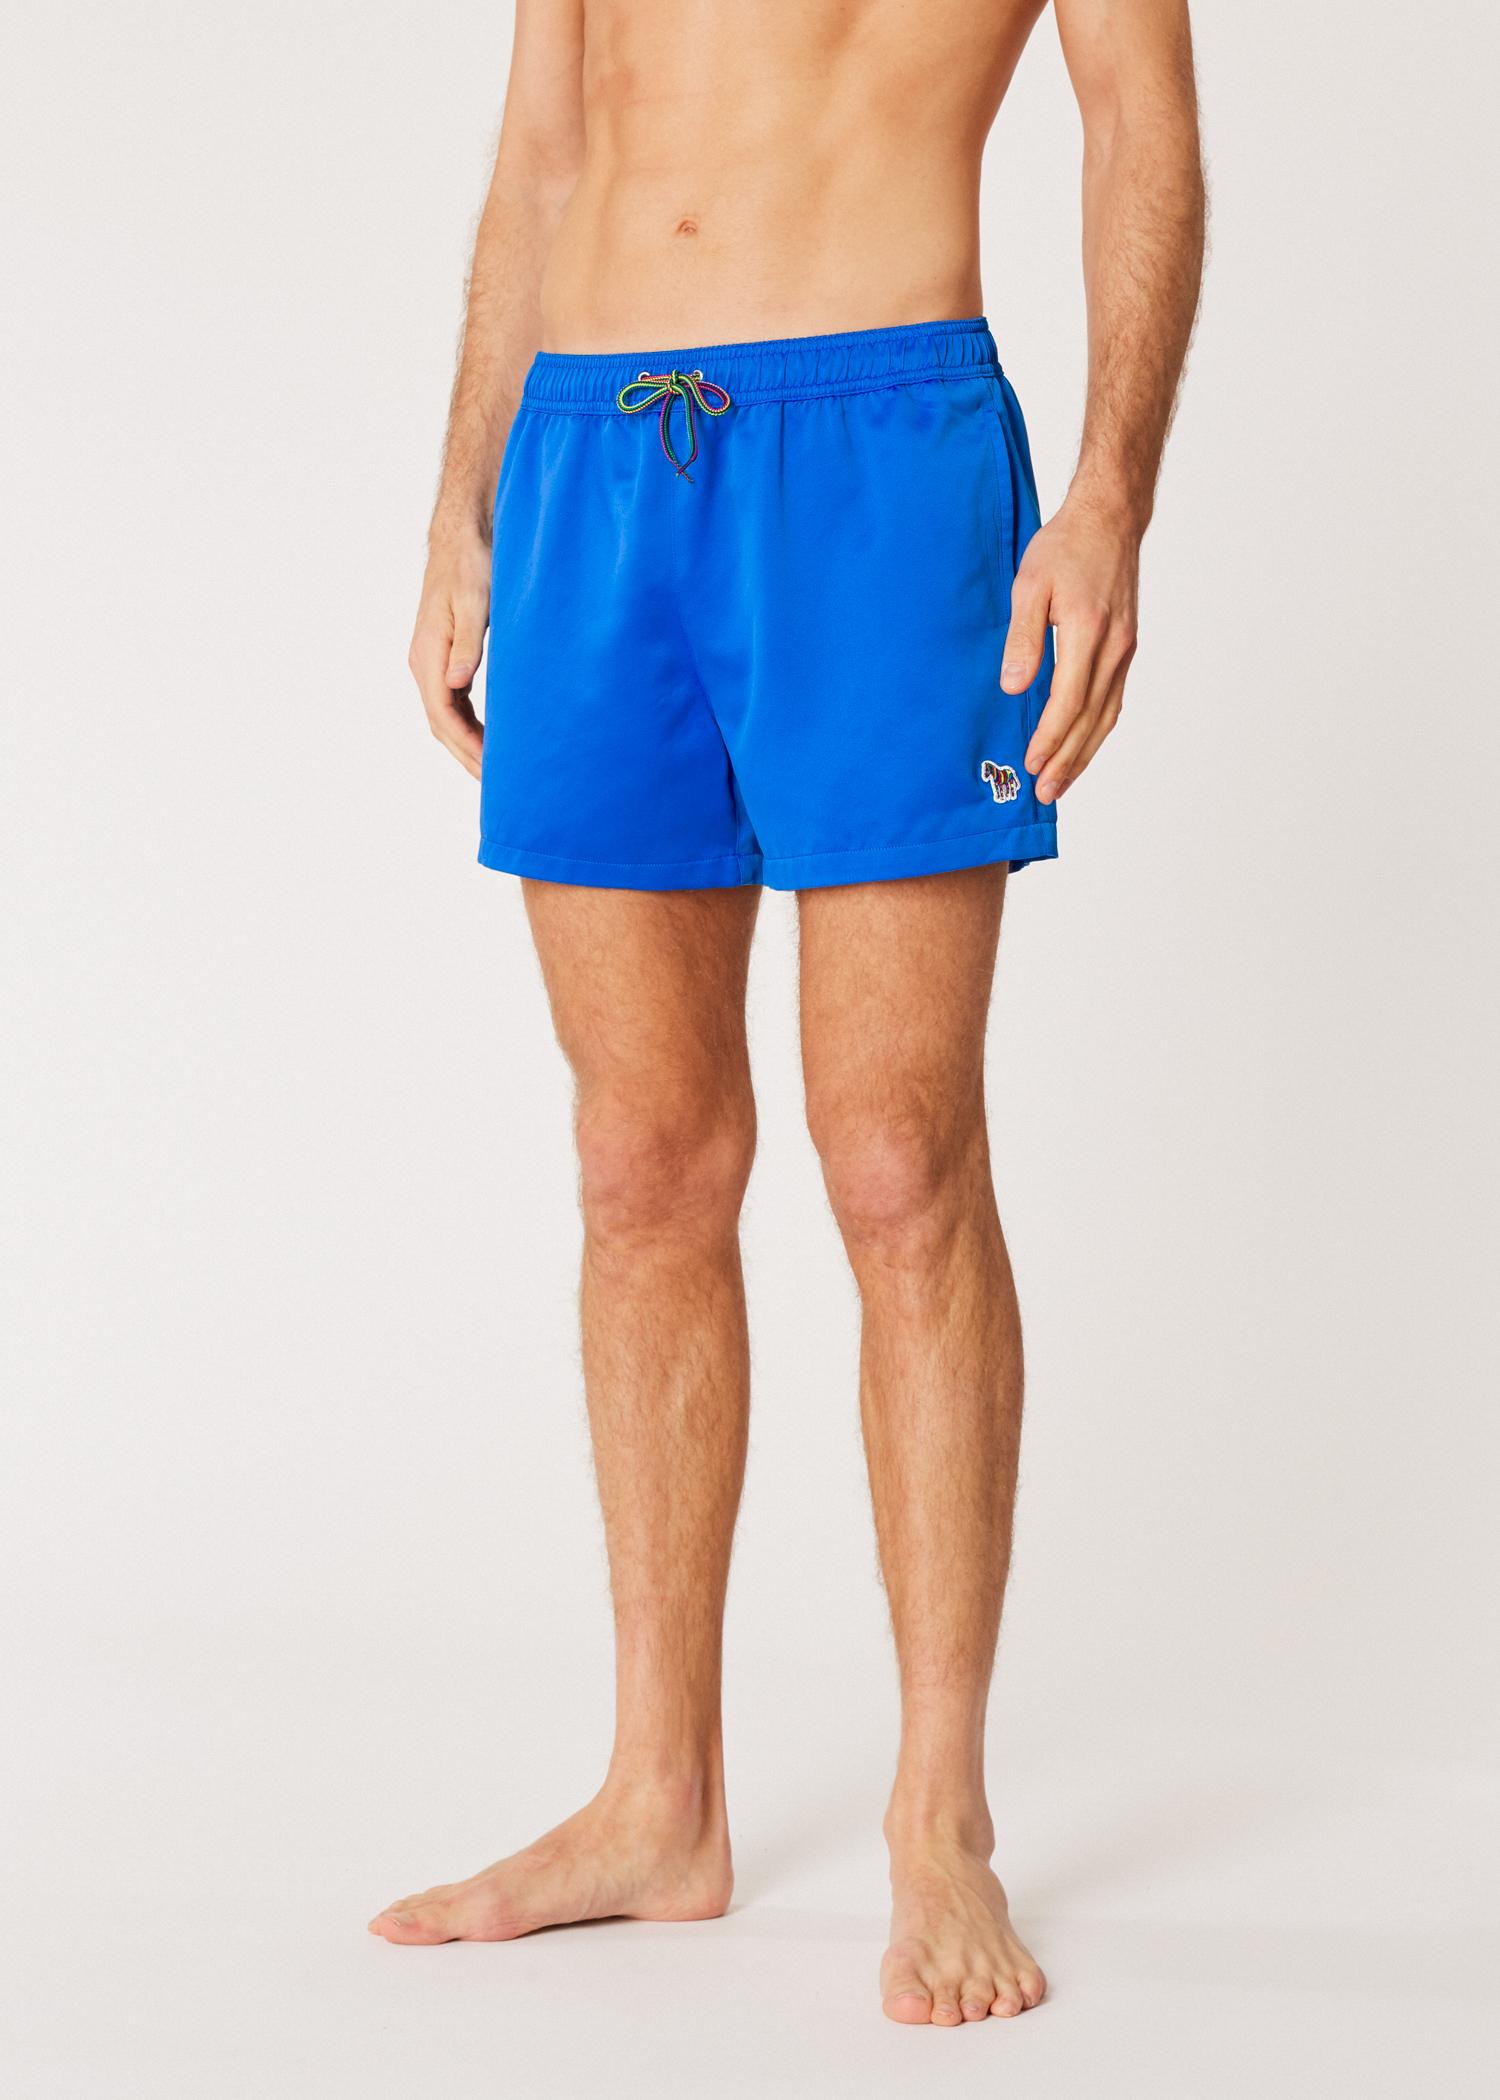 3d293cd45b20a Model front view- Men's Blue Zebra Logo Swim Shorts by Paul Smith